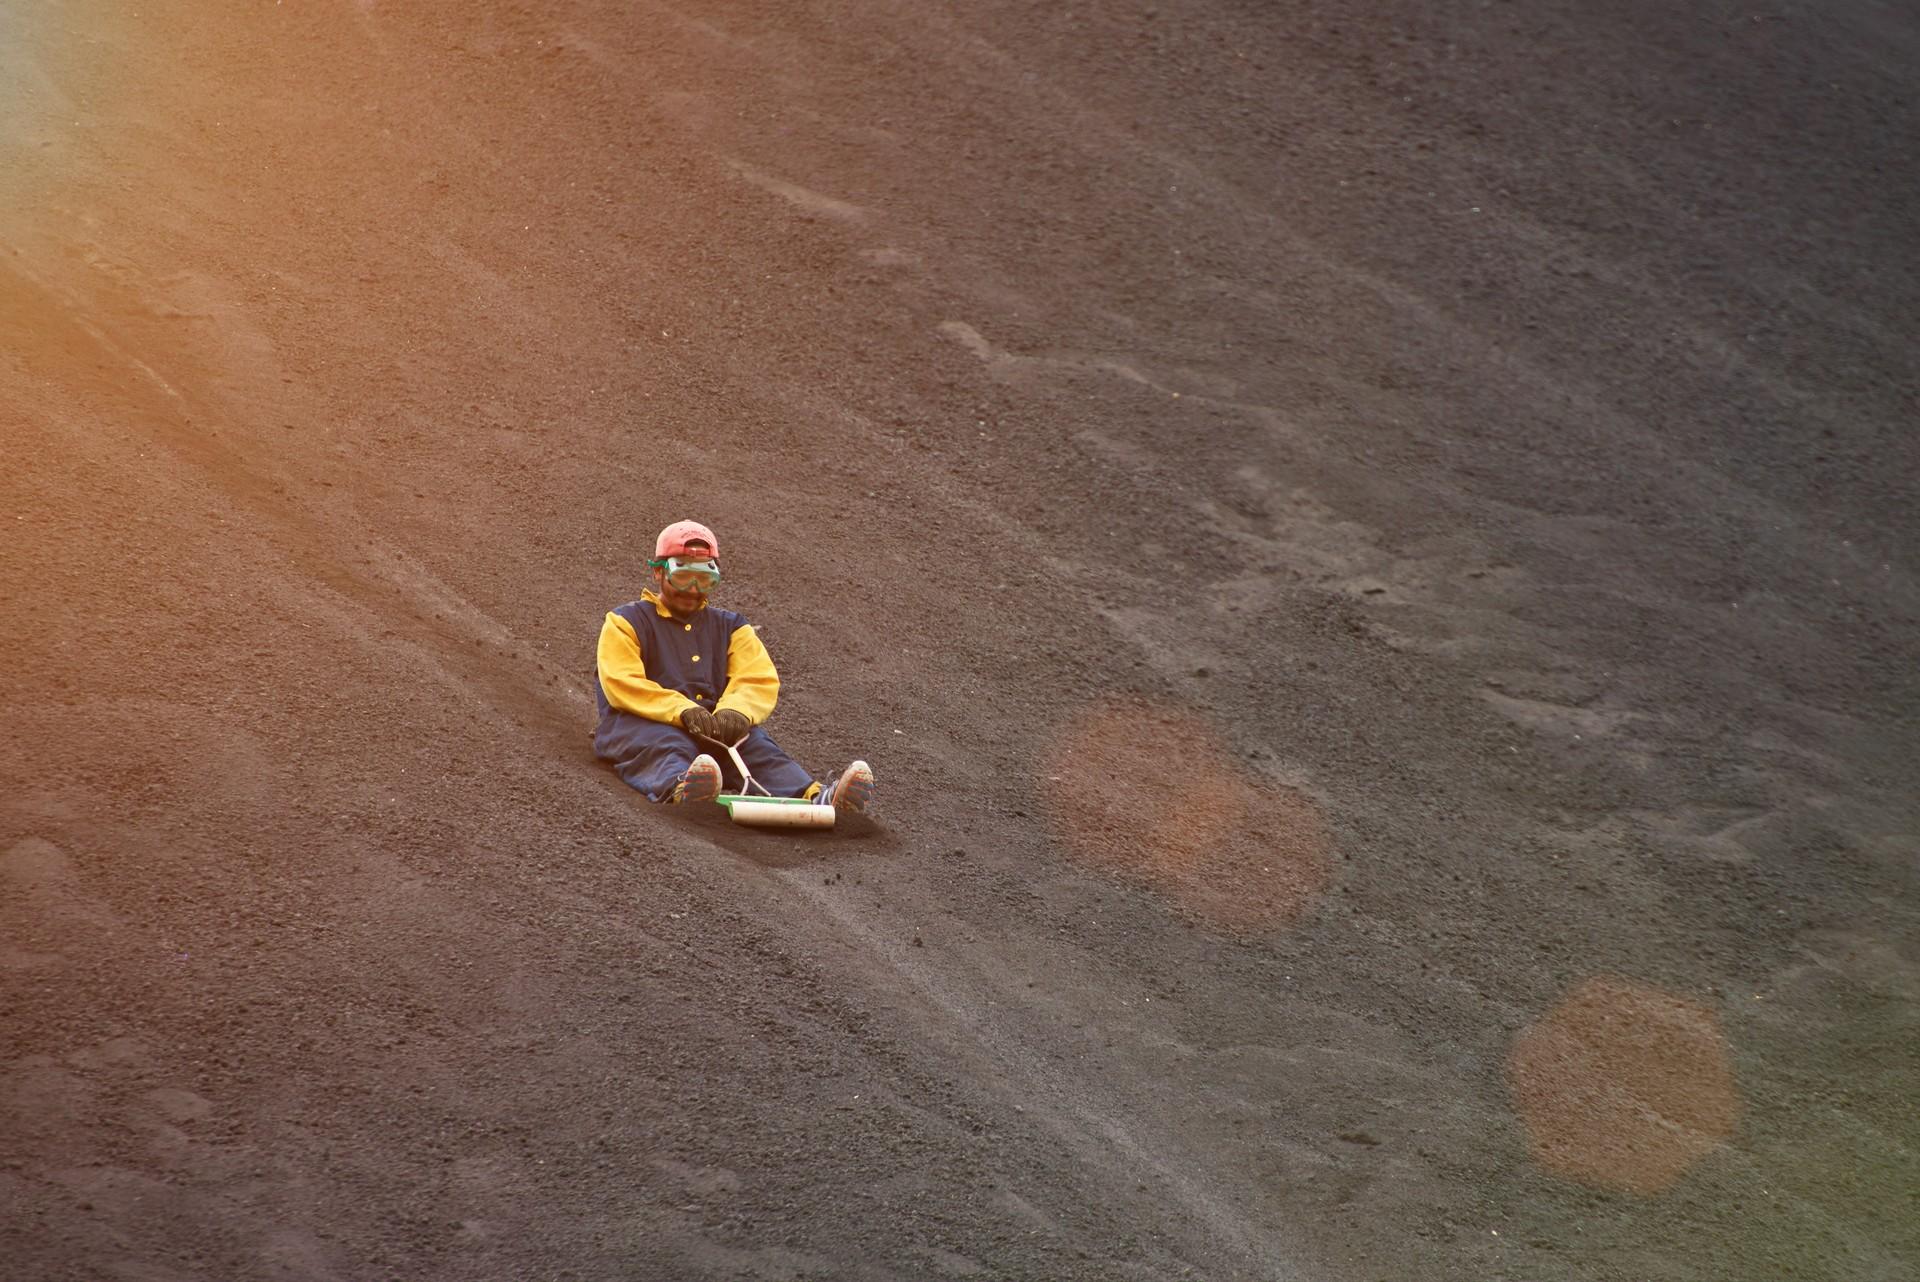 A man volcano boarding in Nicaragua